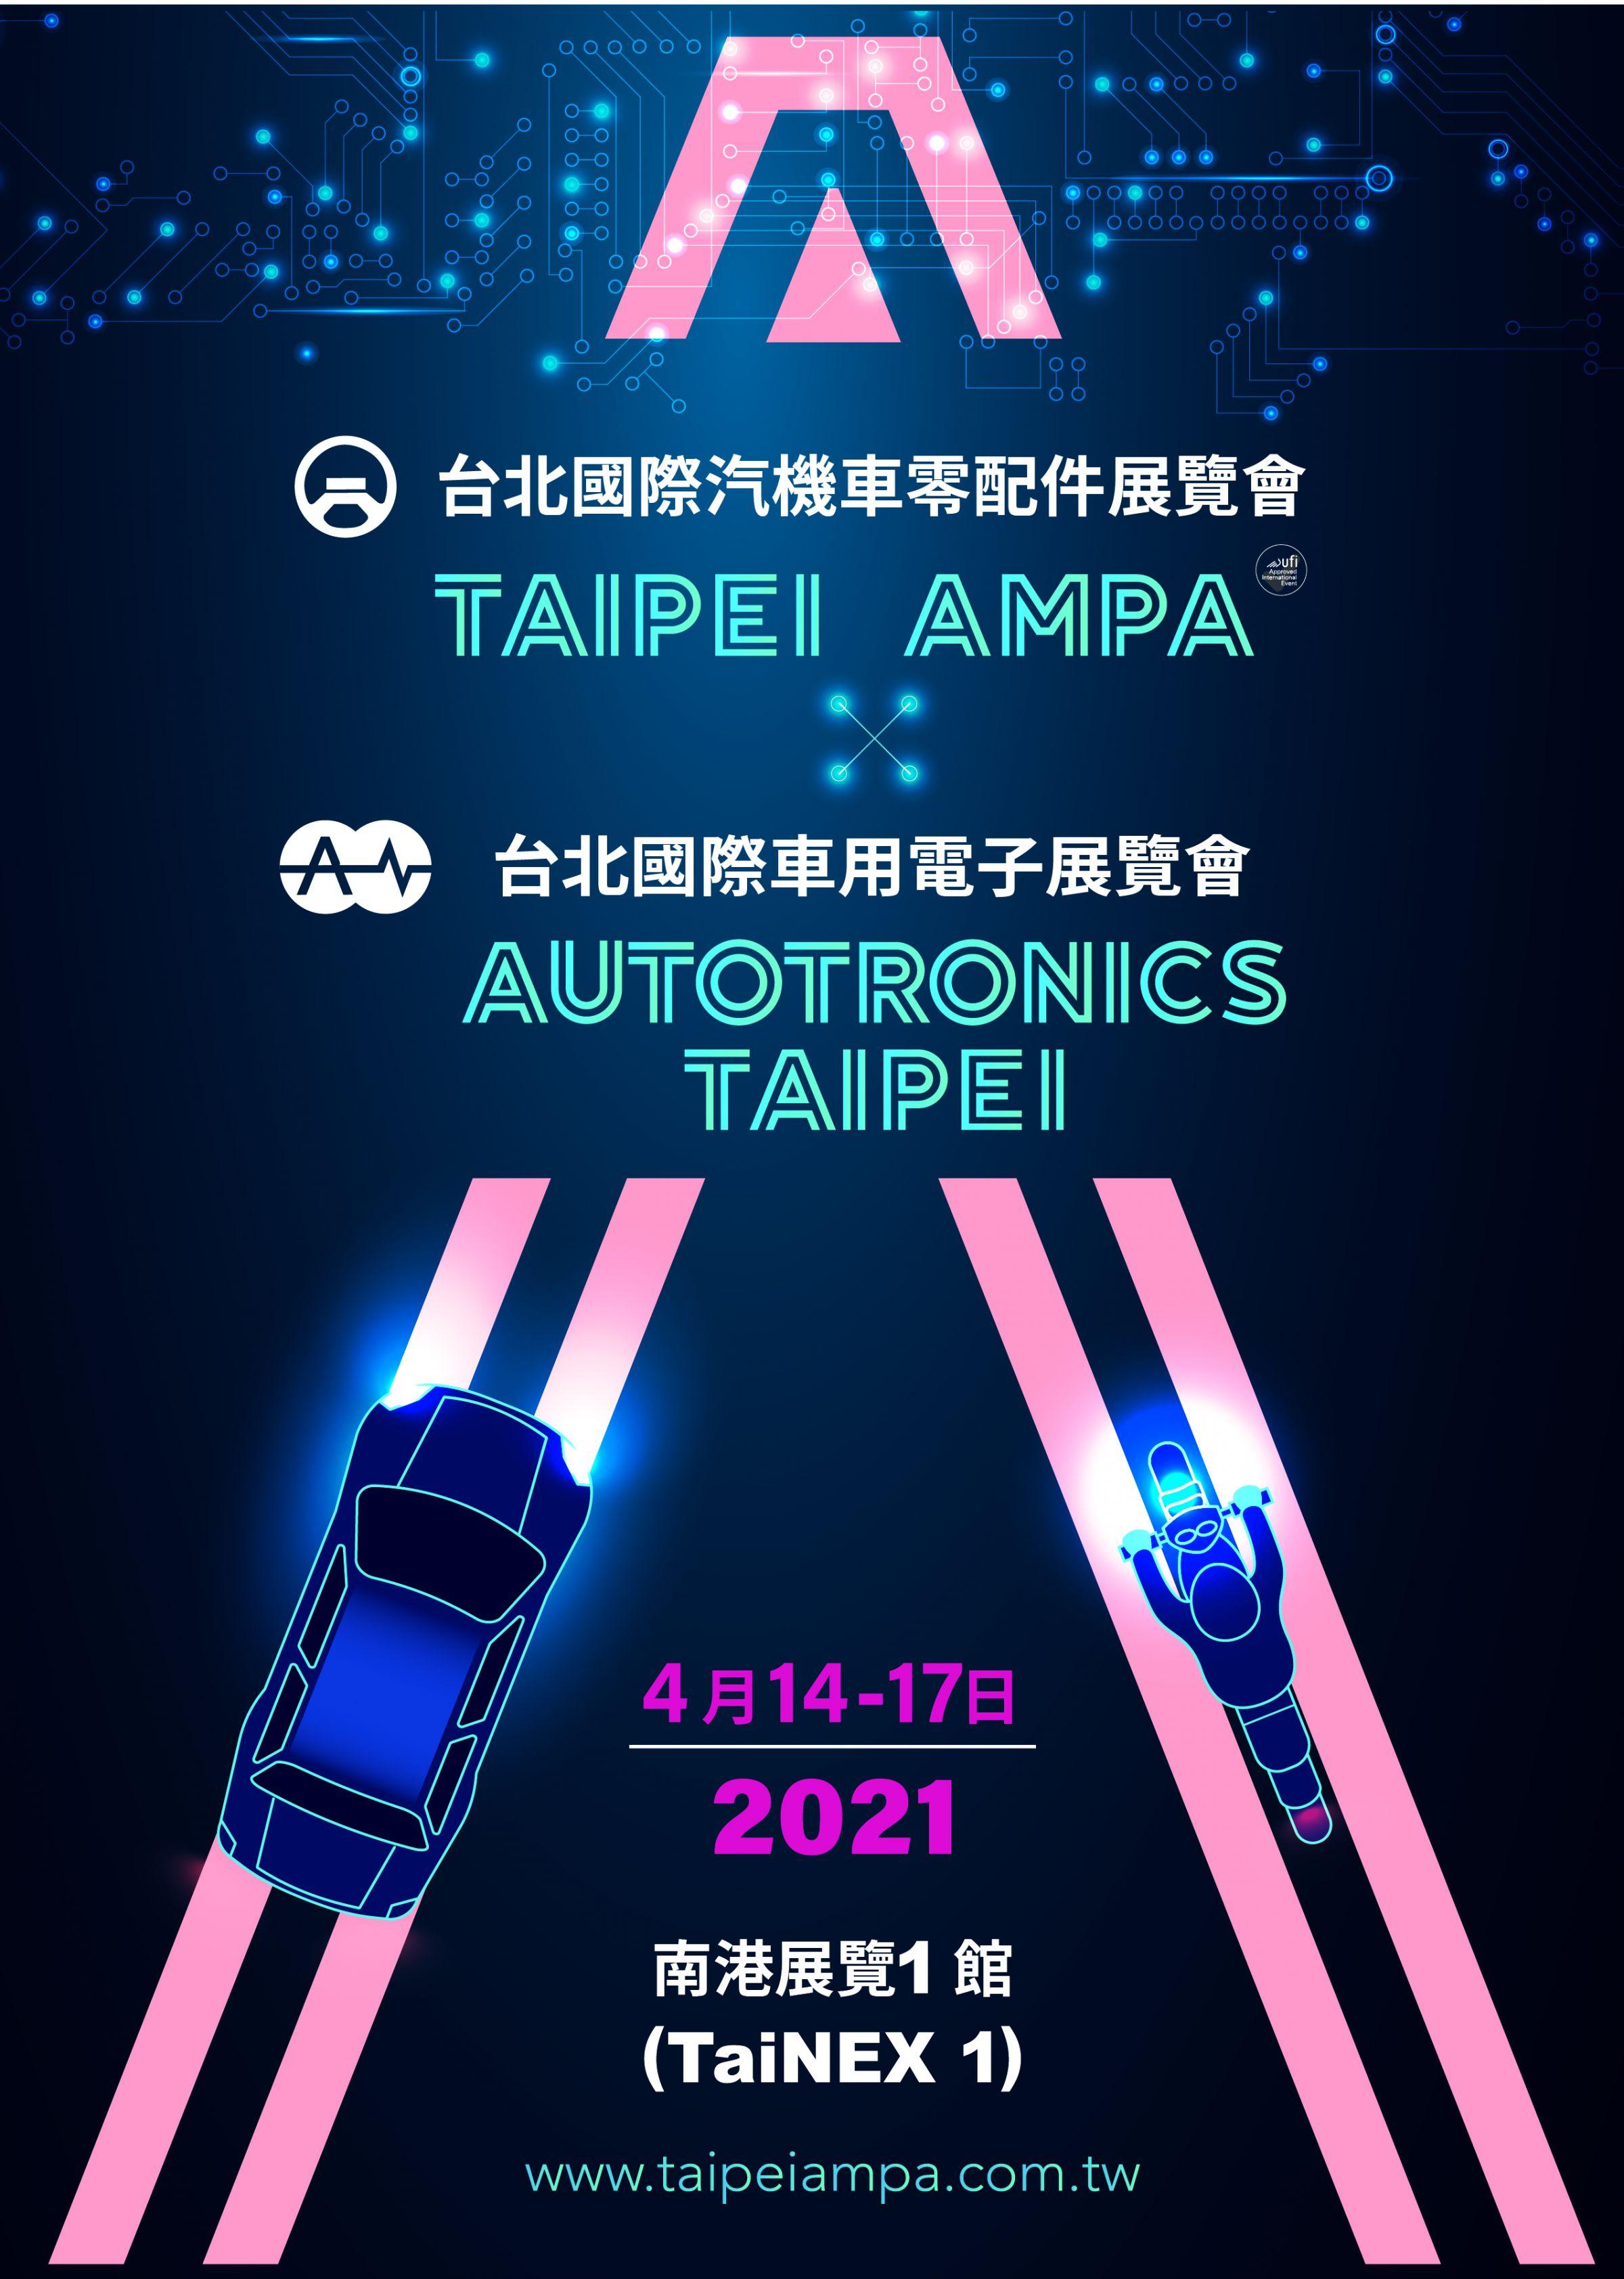 <a href=https://www.taipeiampa.com.tw/index.html/> 2021 台北国际车用电子展(Autotronics Taipei)</a>